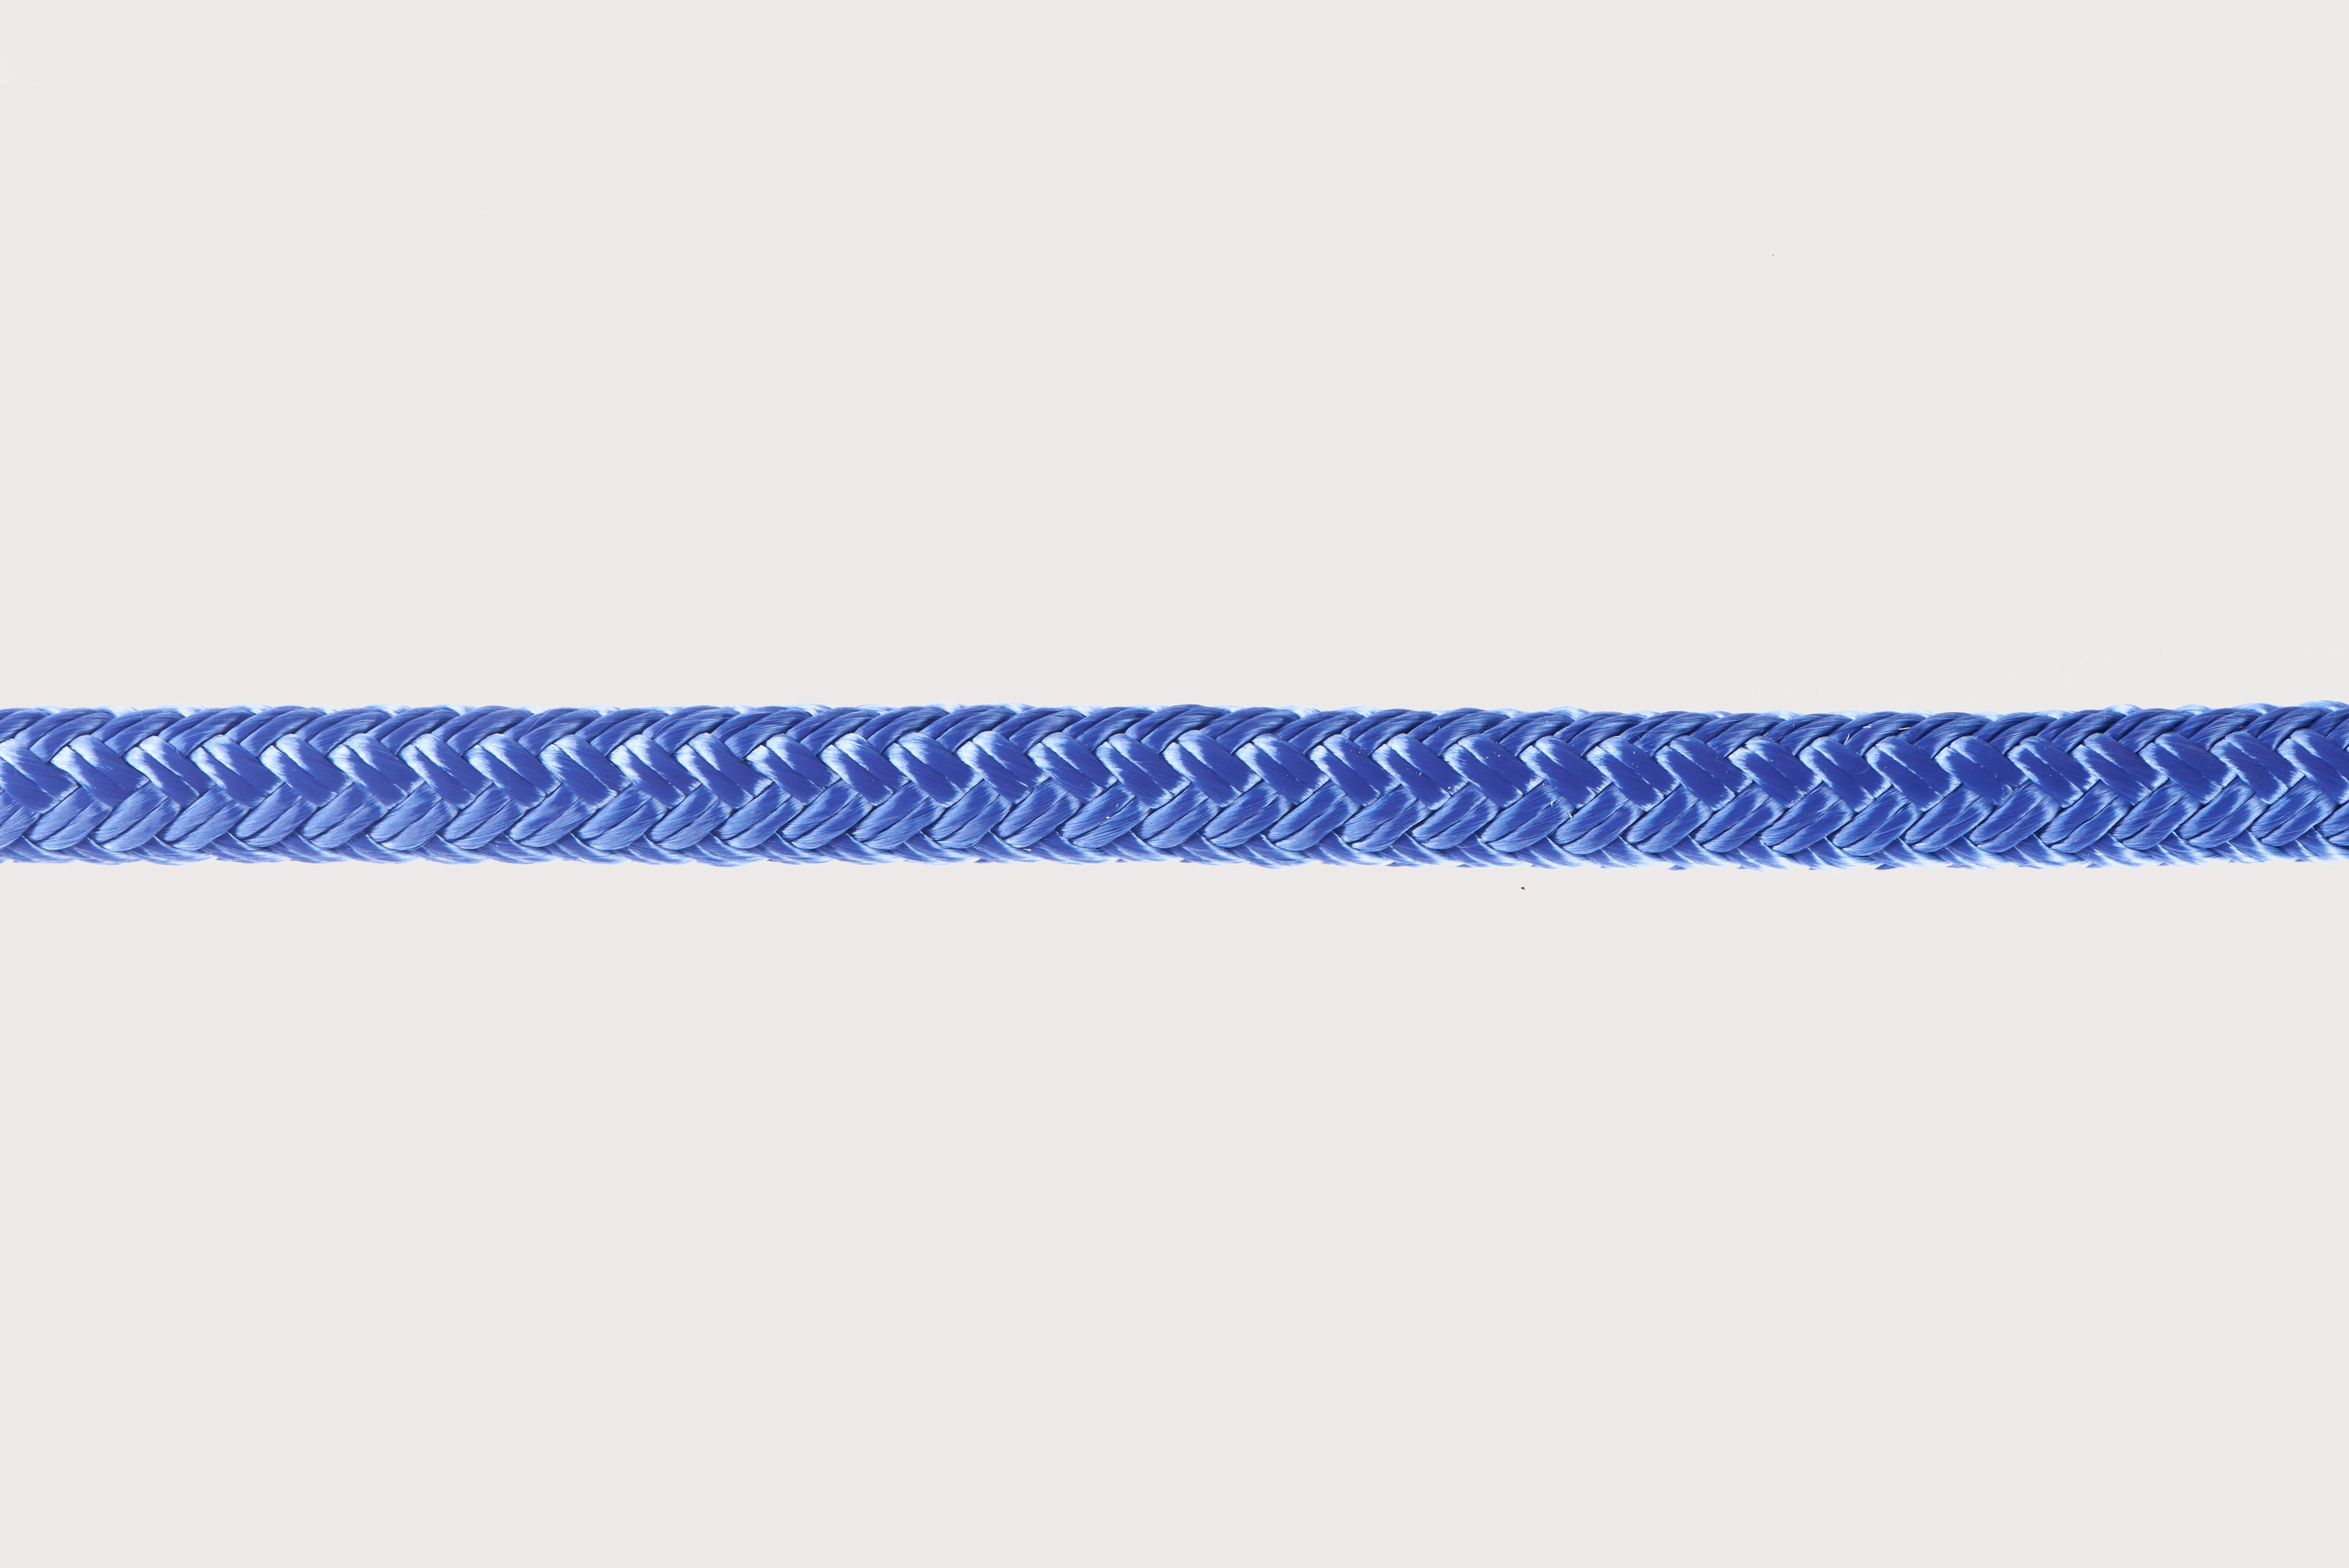 Orion-Cordage-Double Braid Nylon-Blue-Horizontal140.jpg